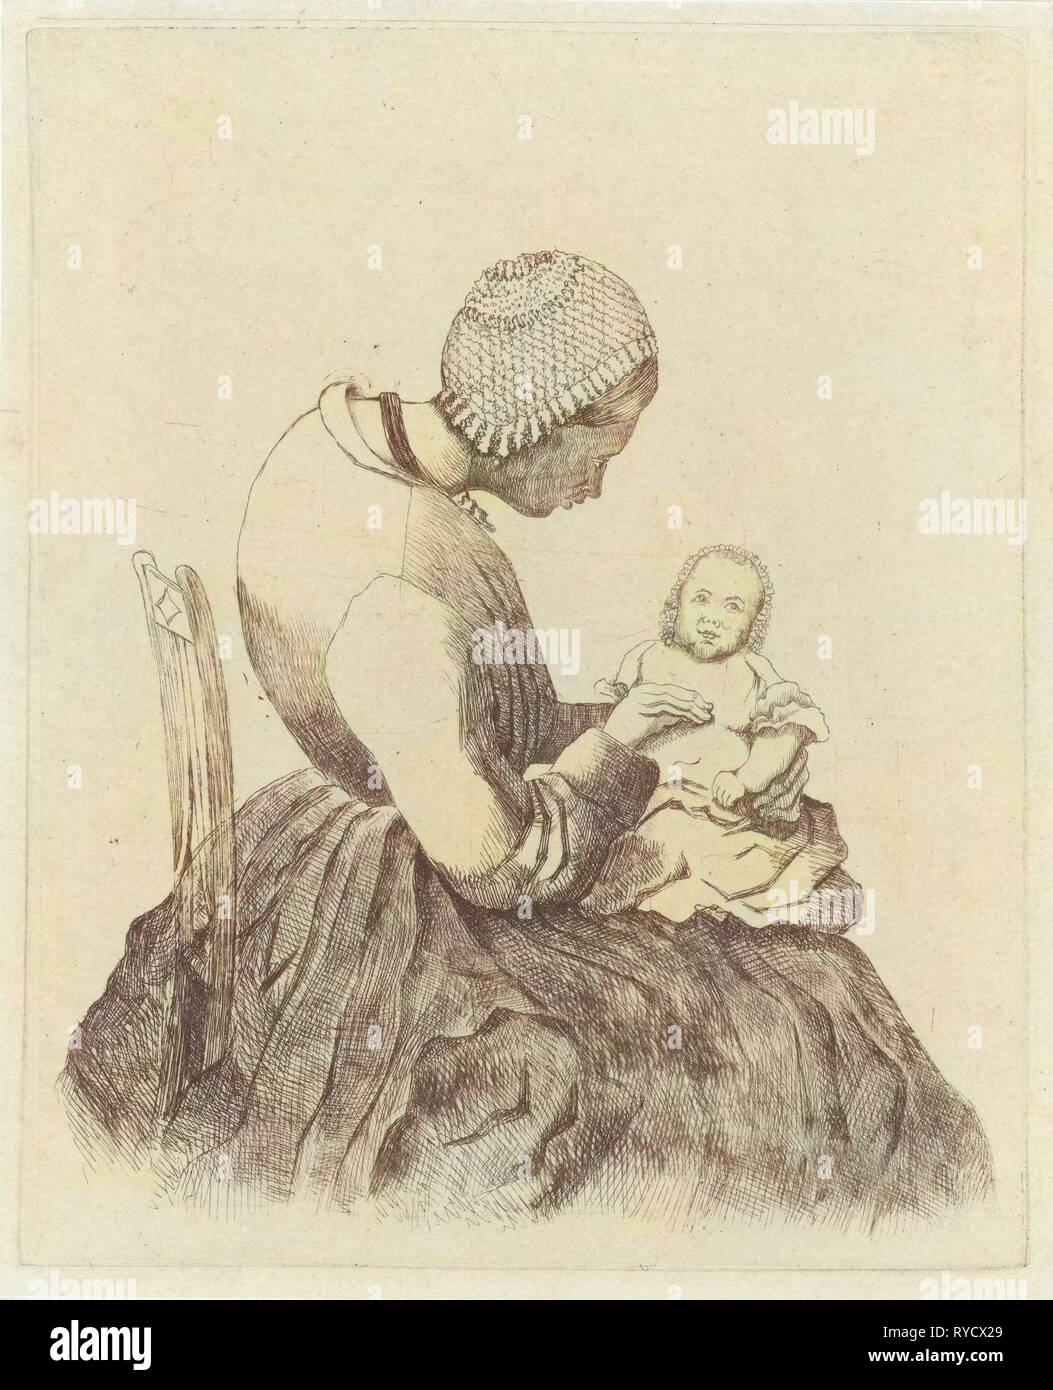 Mother with child, Eberhard Cornelis Rahms, 1859 - Stock Image